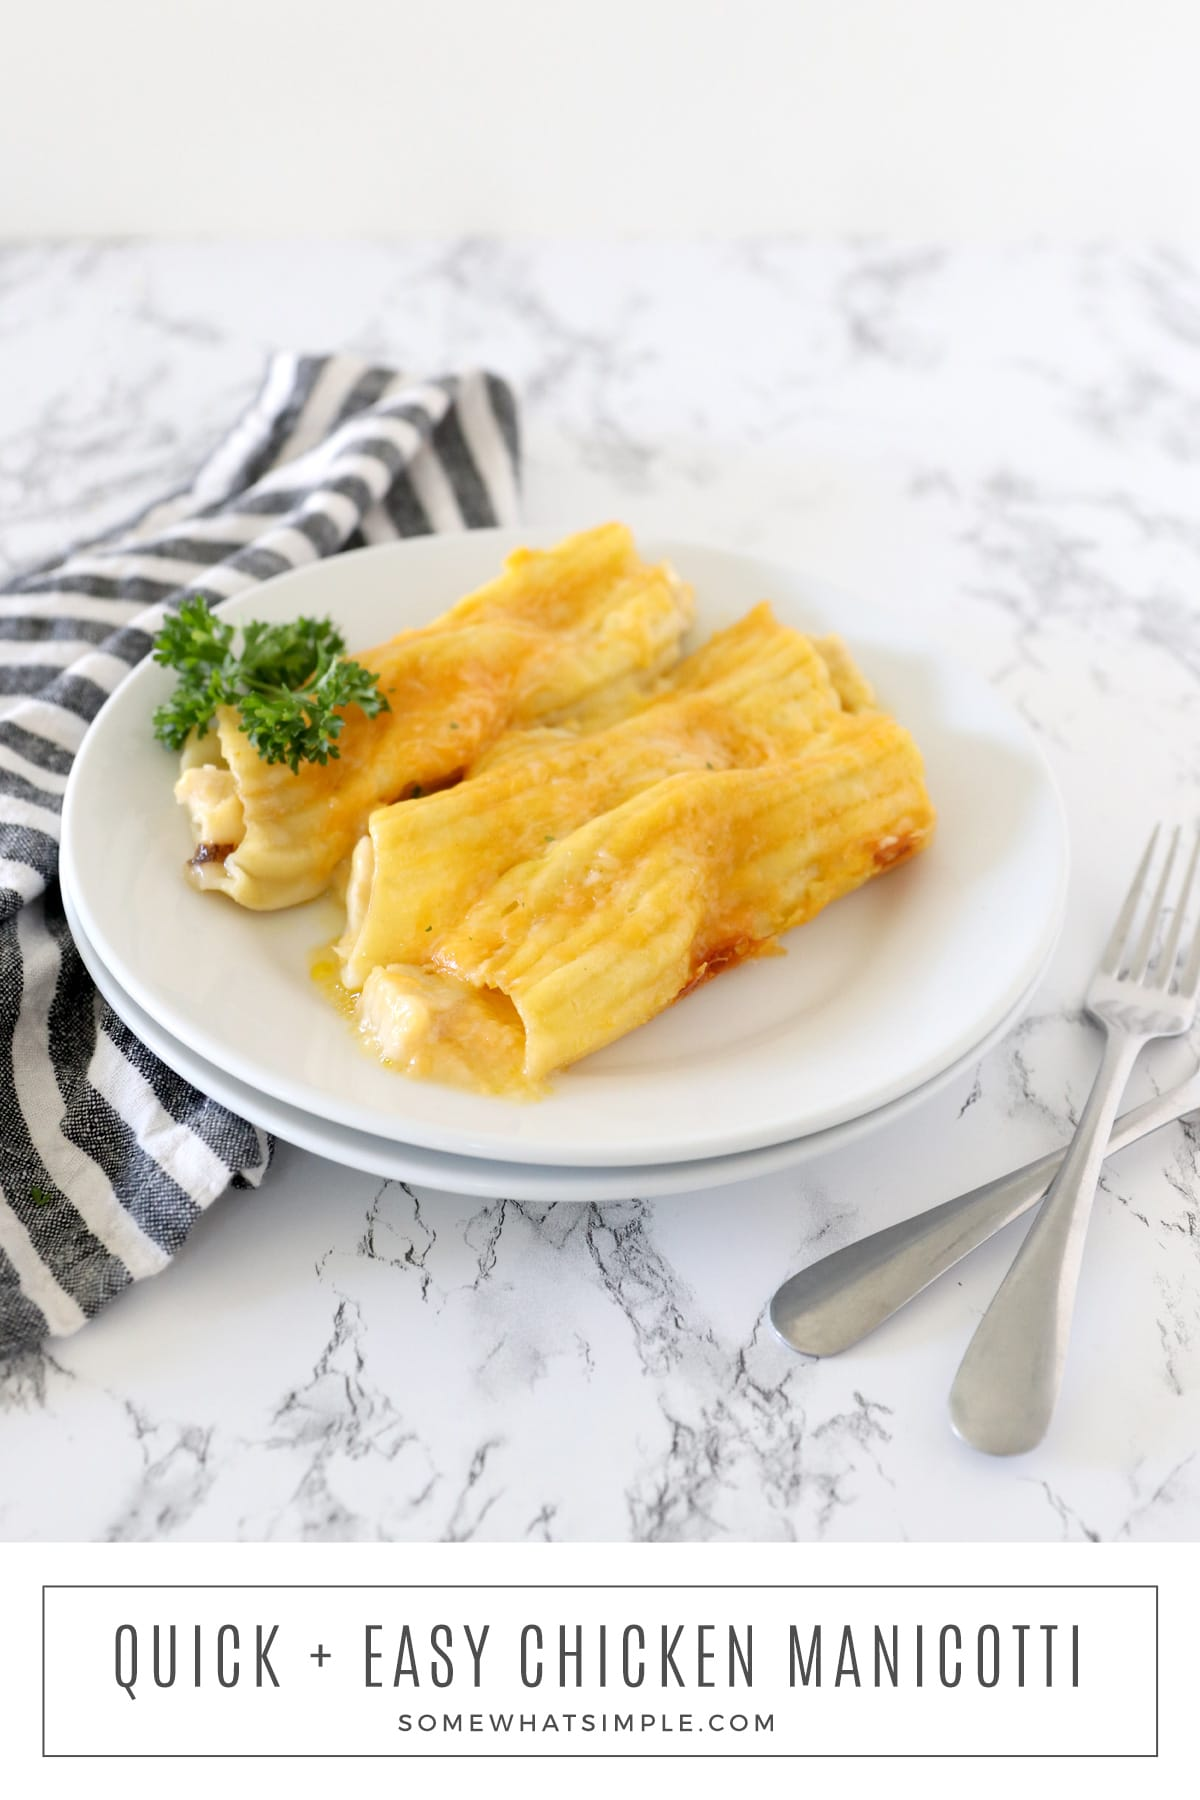 This Shortcut Chicken Manicotti recipe is a simple way to prepare a delicious Italian dish! via @somewhatsimple